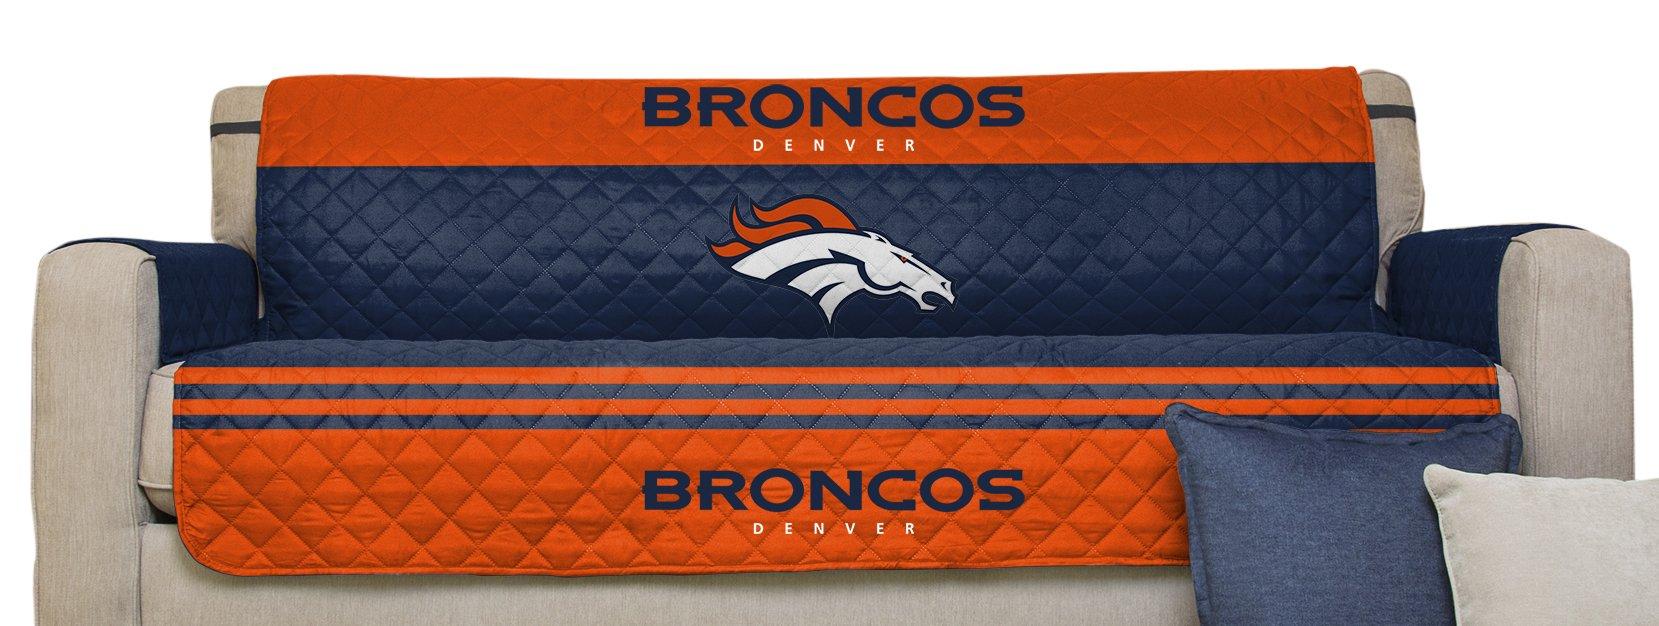 Pegasus Home Fashions NFL Denver Broncos Sofa Furniture Protector with Elastic Straps, 75 x 110